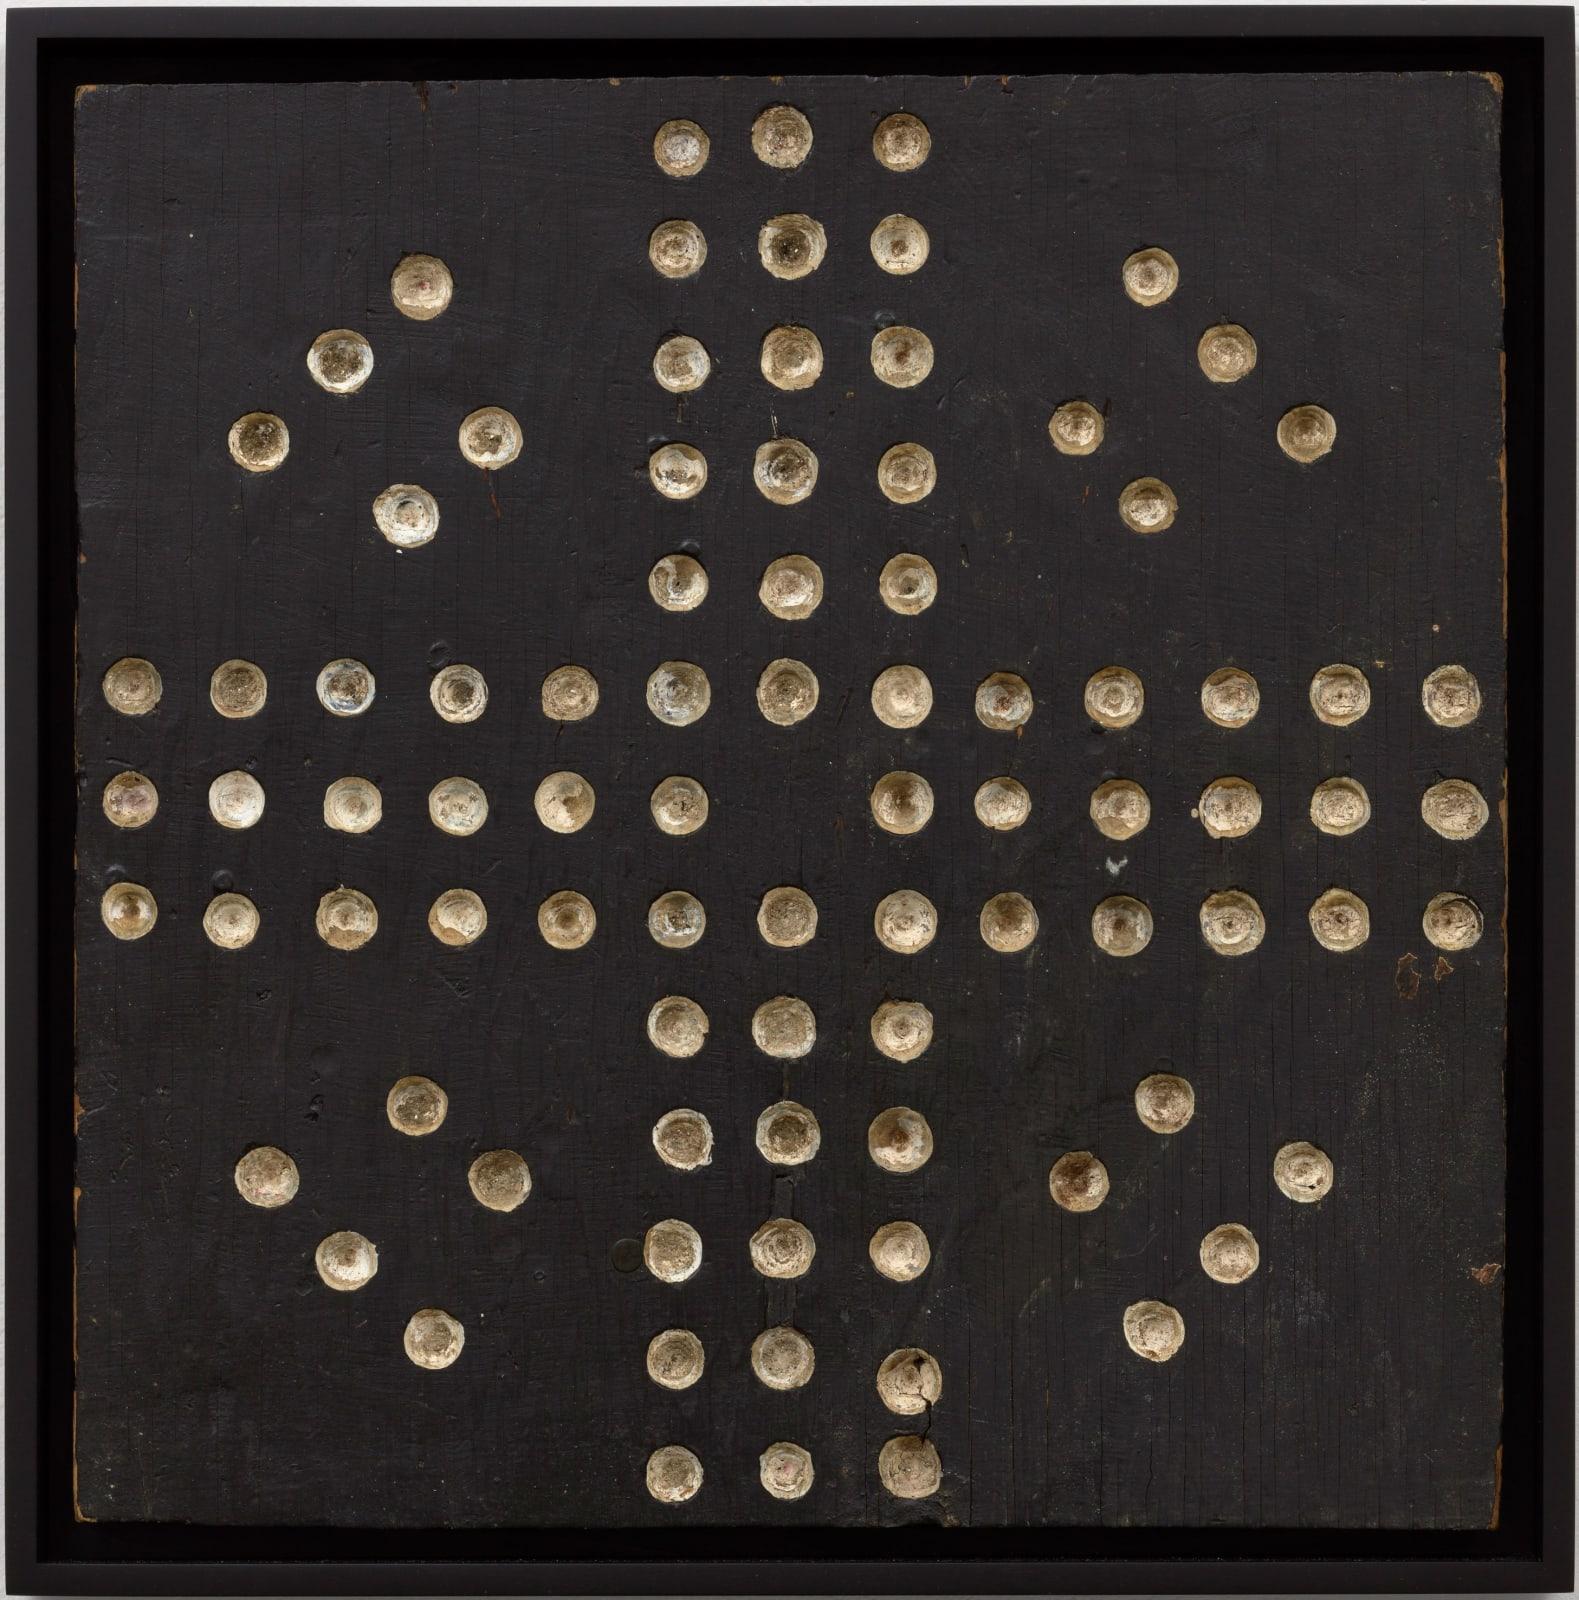 Wahoo Game Board, c. 1920-30 16 1/2 x 16 in. 41.9 x 40.6 cm. (AU 308)